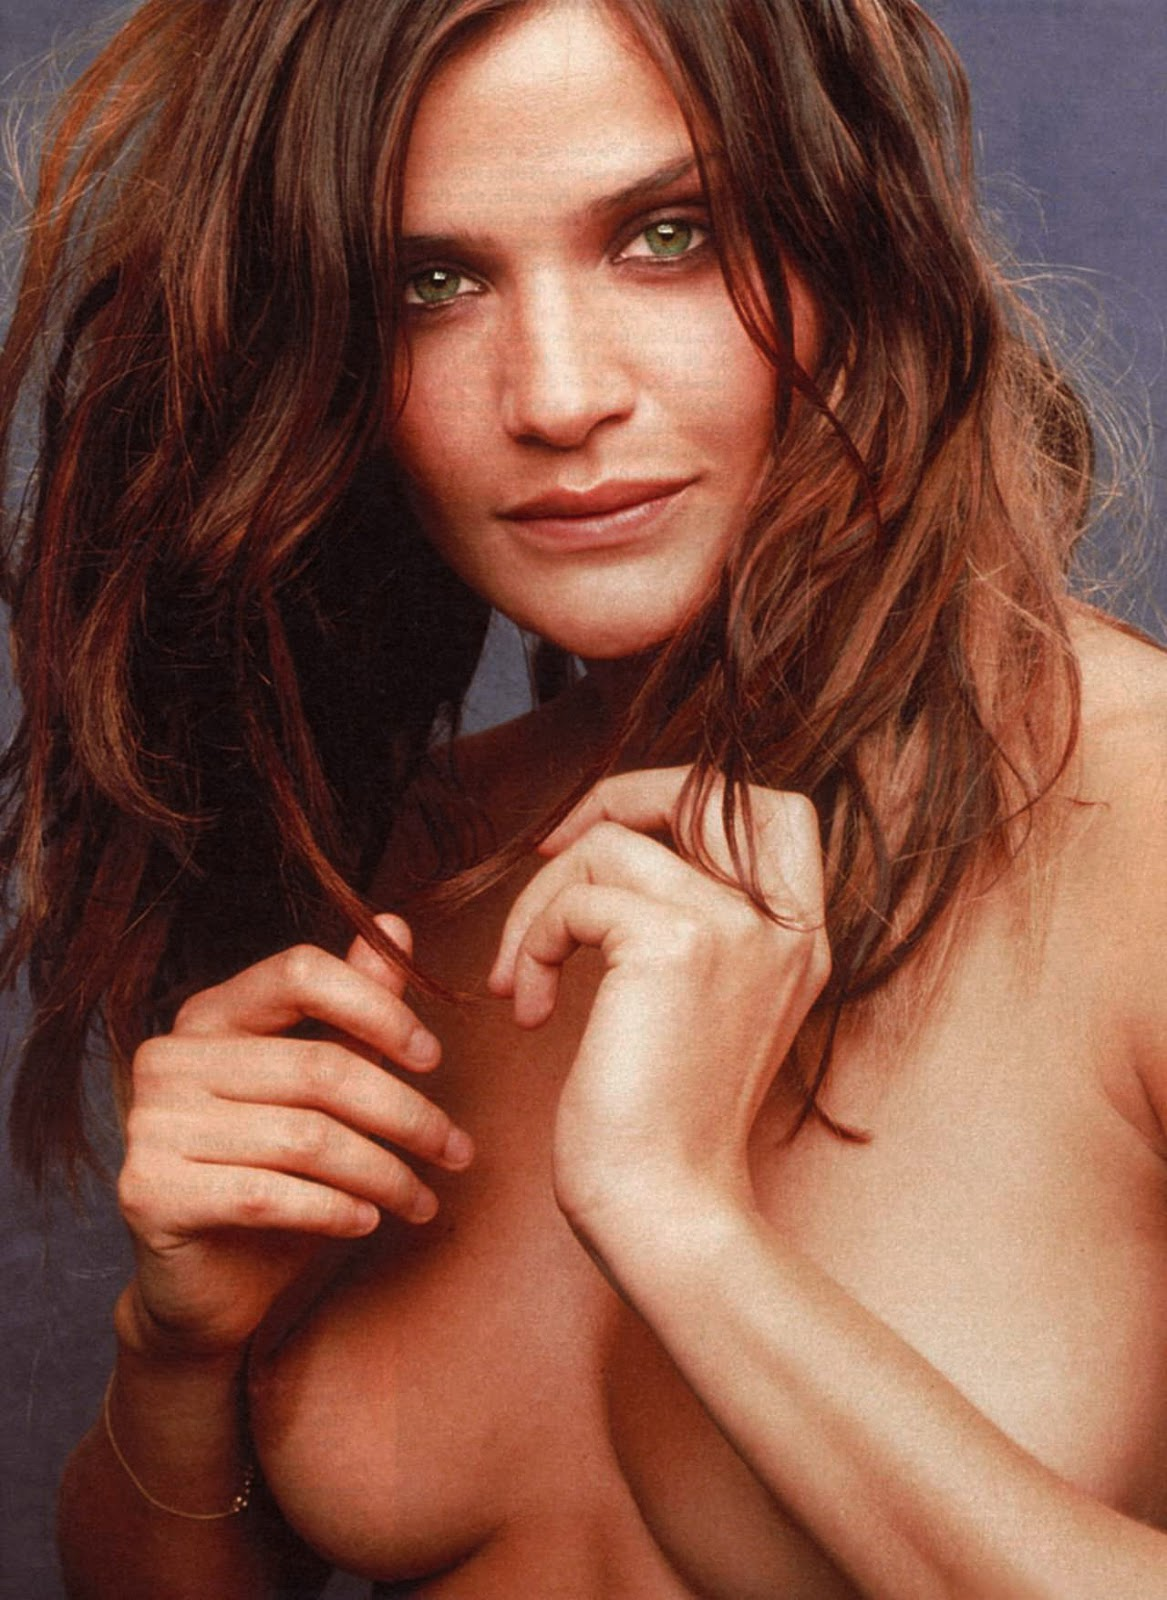 Helena Christensen Nude Pics